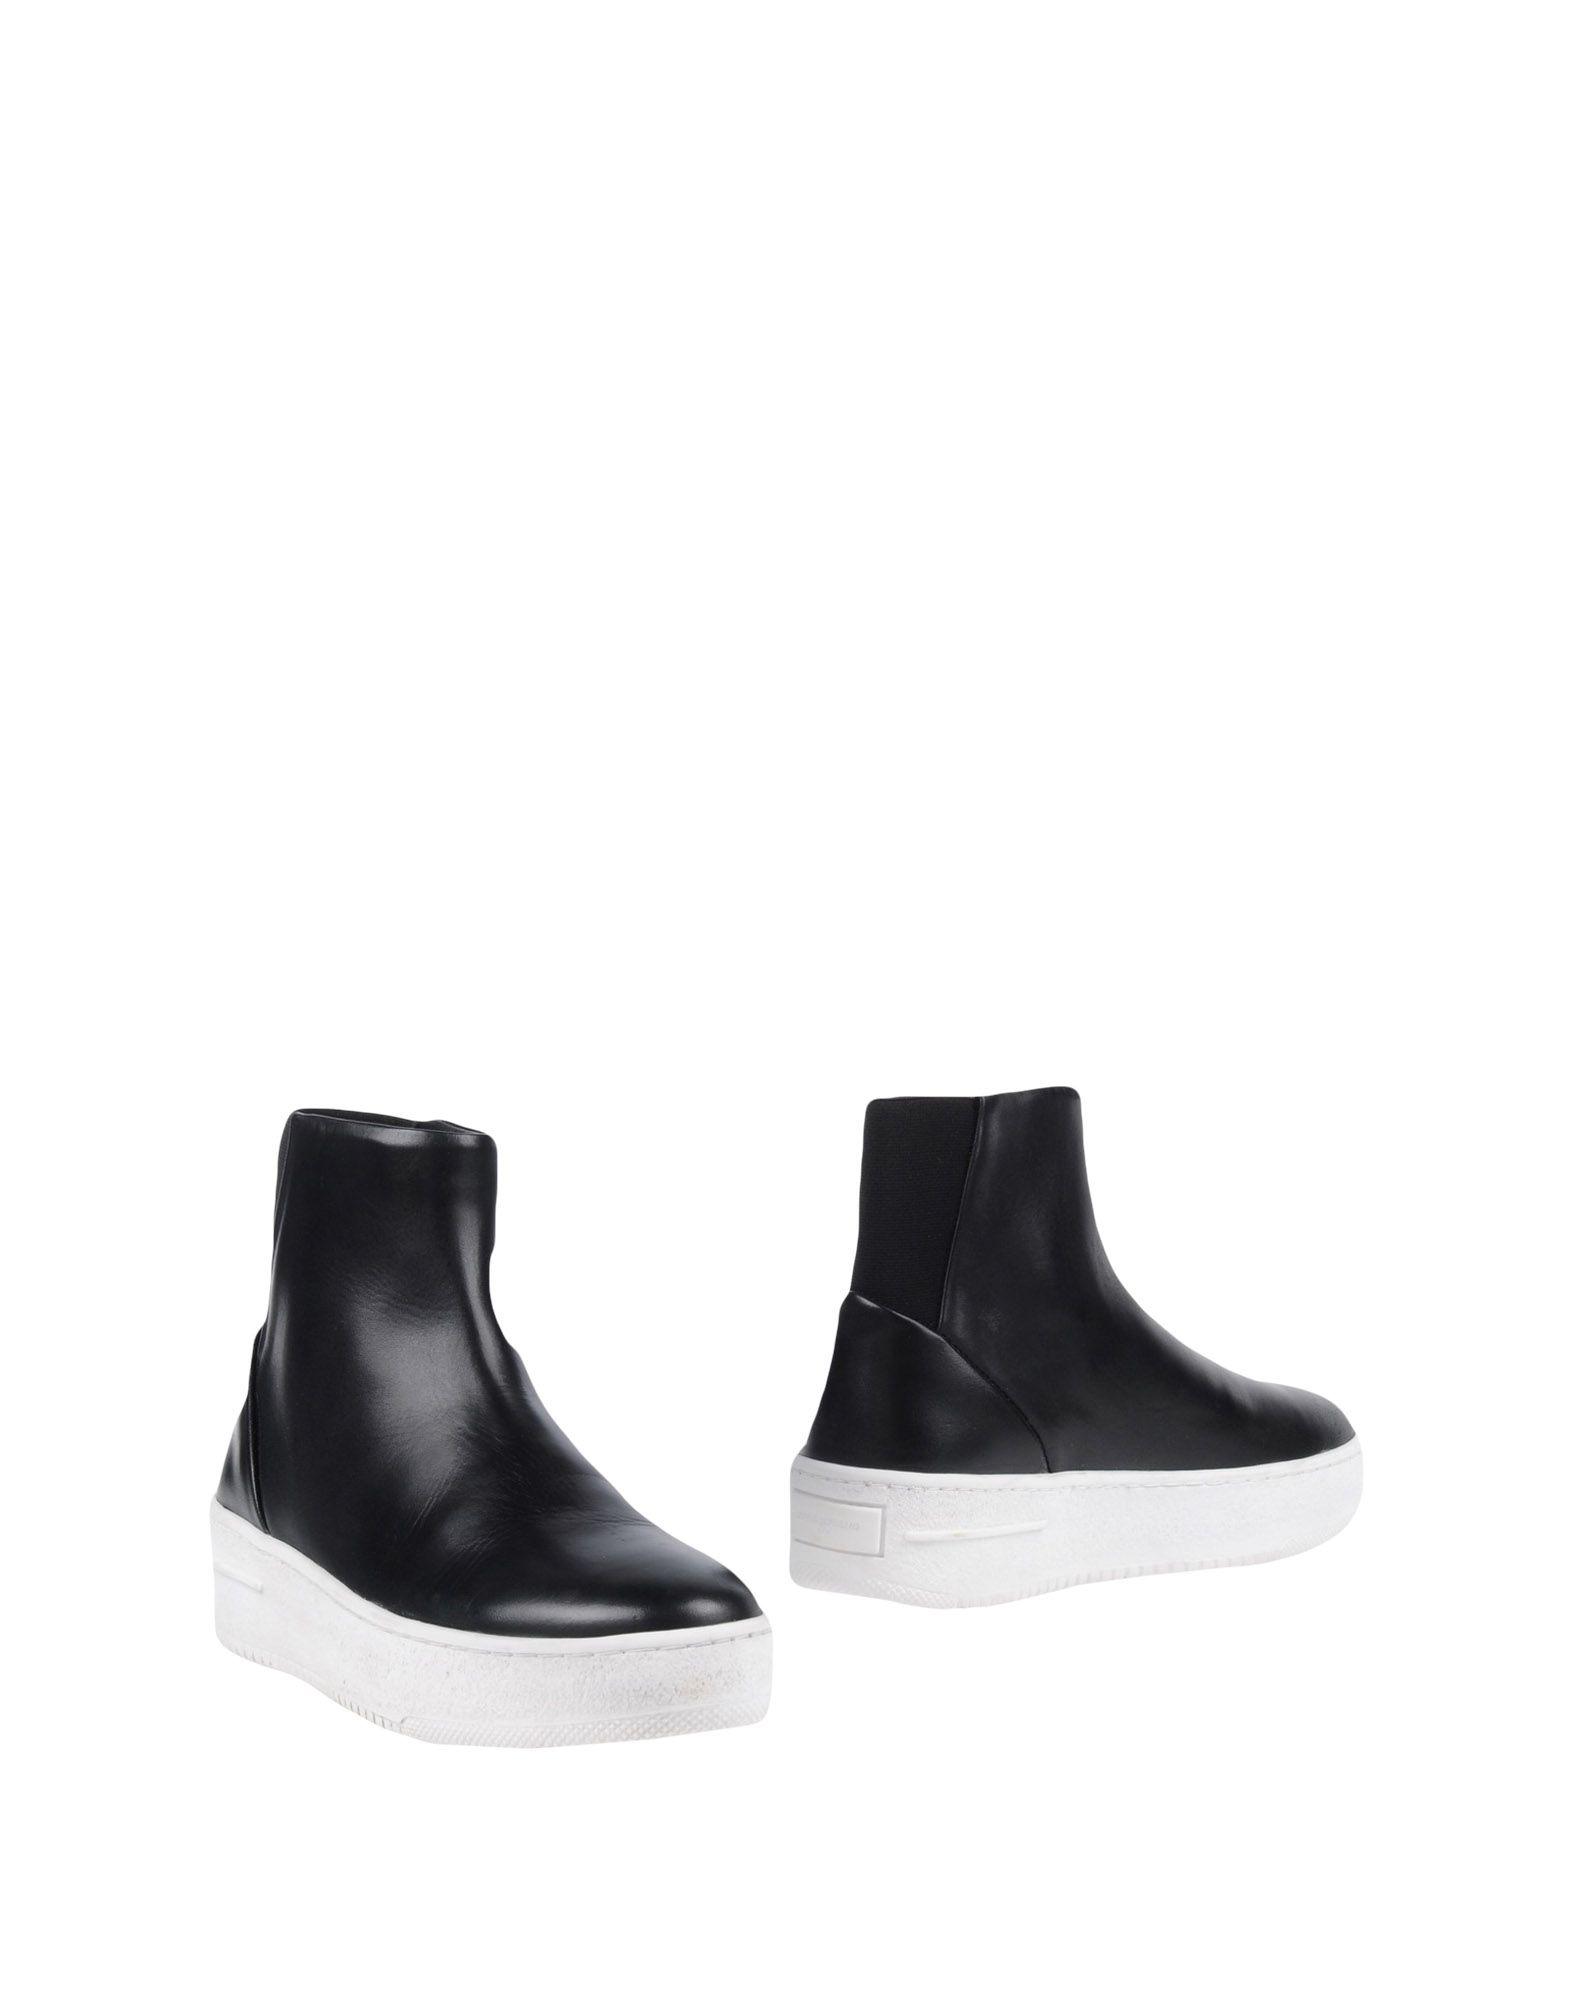 Royal Republiq Ankle Boot Ankle - Women Royal Republiq Ankle Boot Boots online on  United Kingdom - 11460832DI 9c5e98